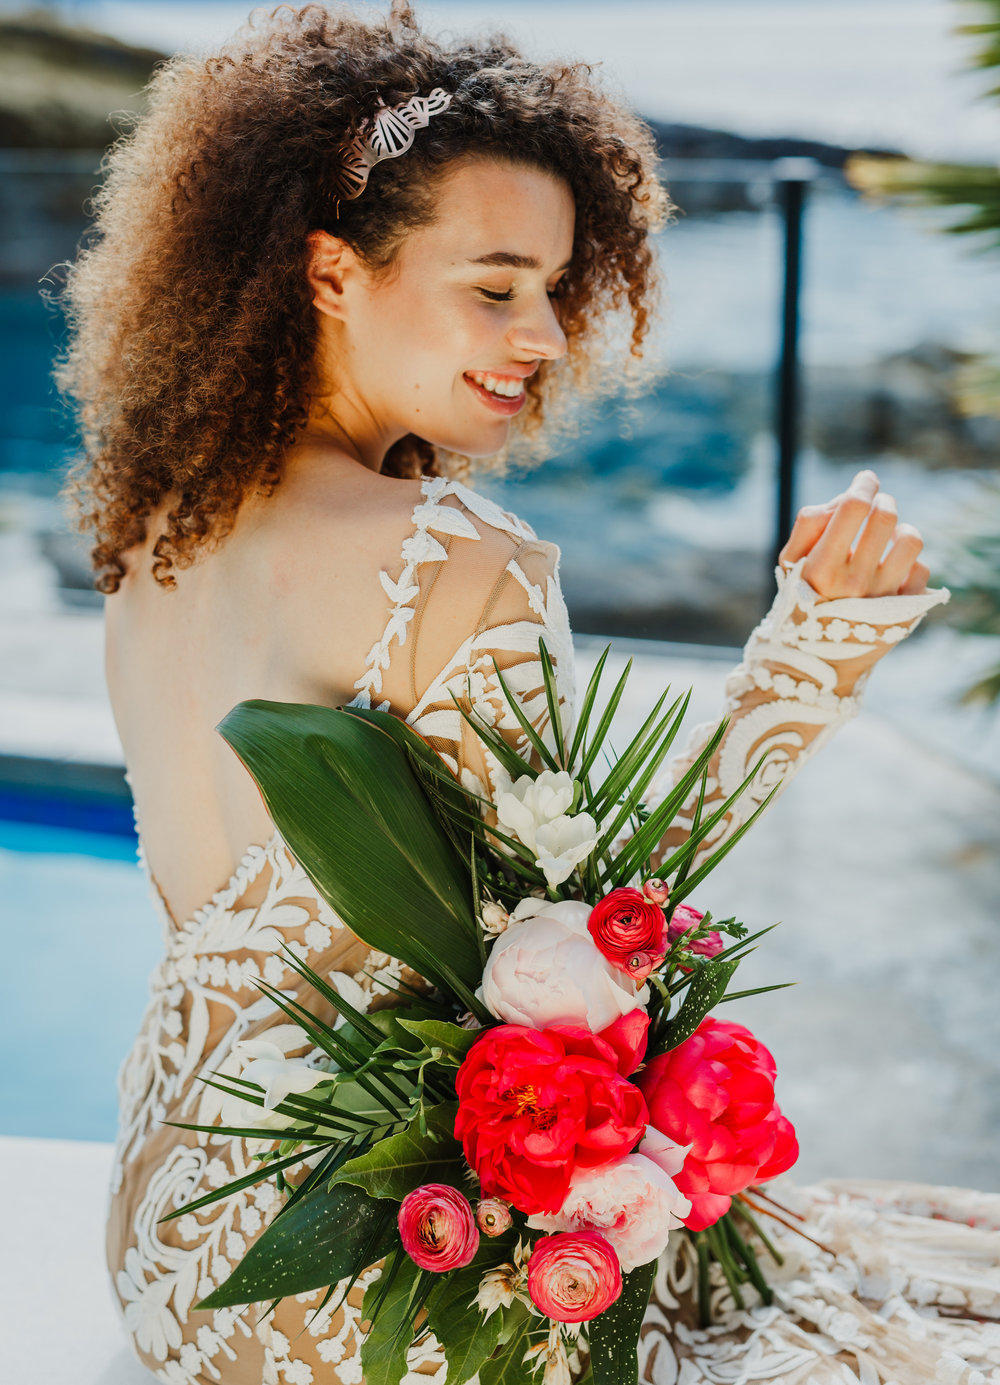 West Coast Bride - Vancouver Wedding Photographer & Videographer - Sunshine Coast Wedding Photos - Sunshine Coast Wedding Photographer - Jennifer Picard Photography - IMG_6703.jpg